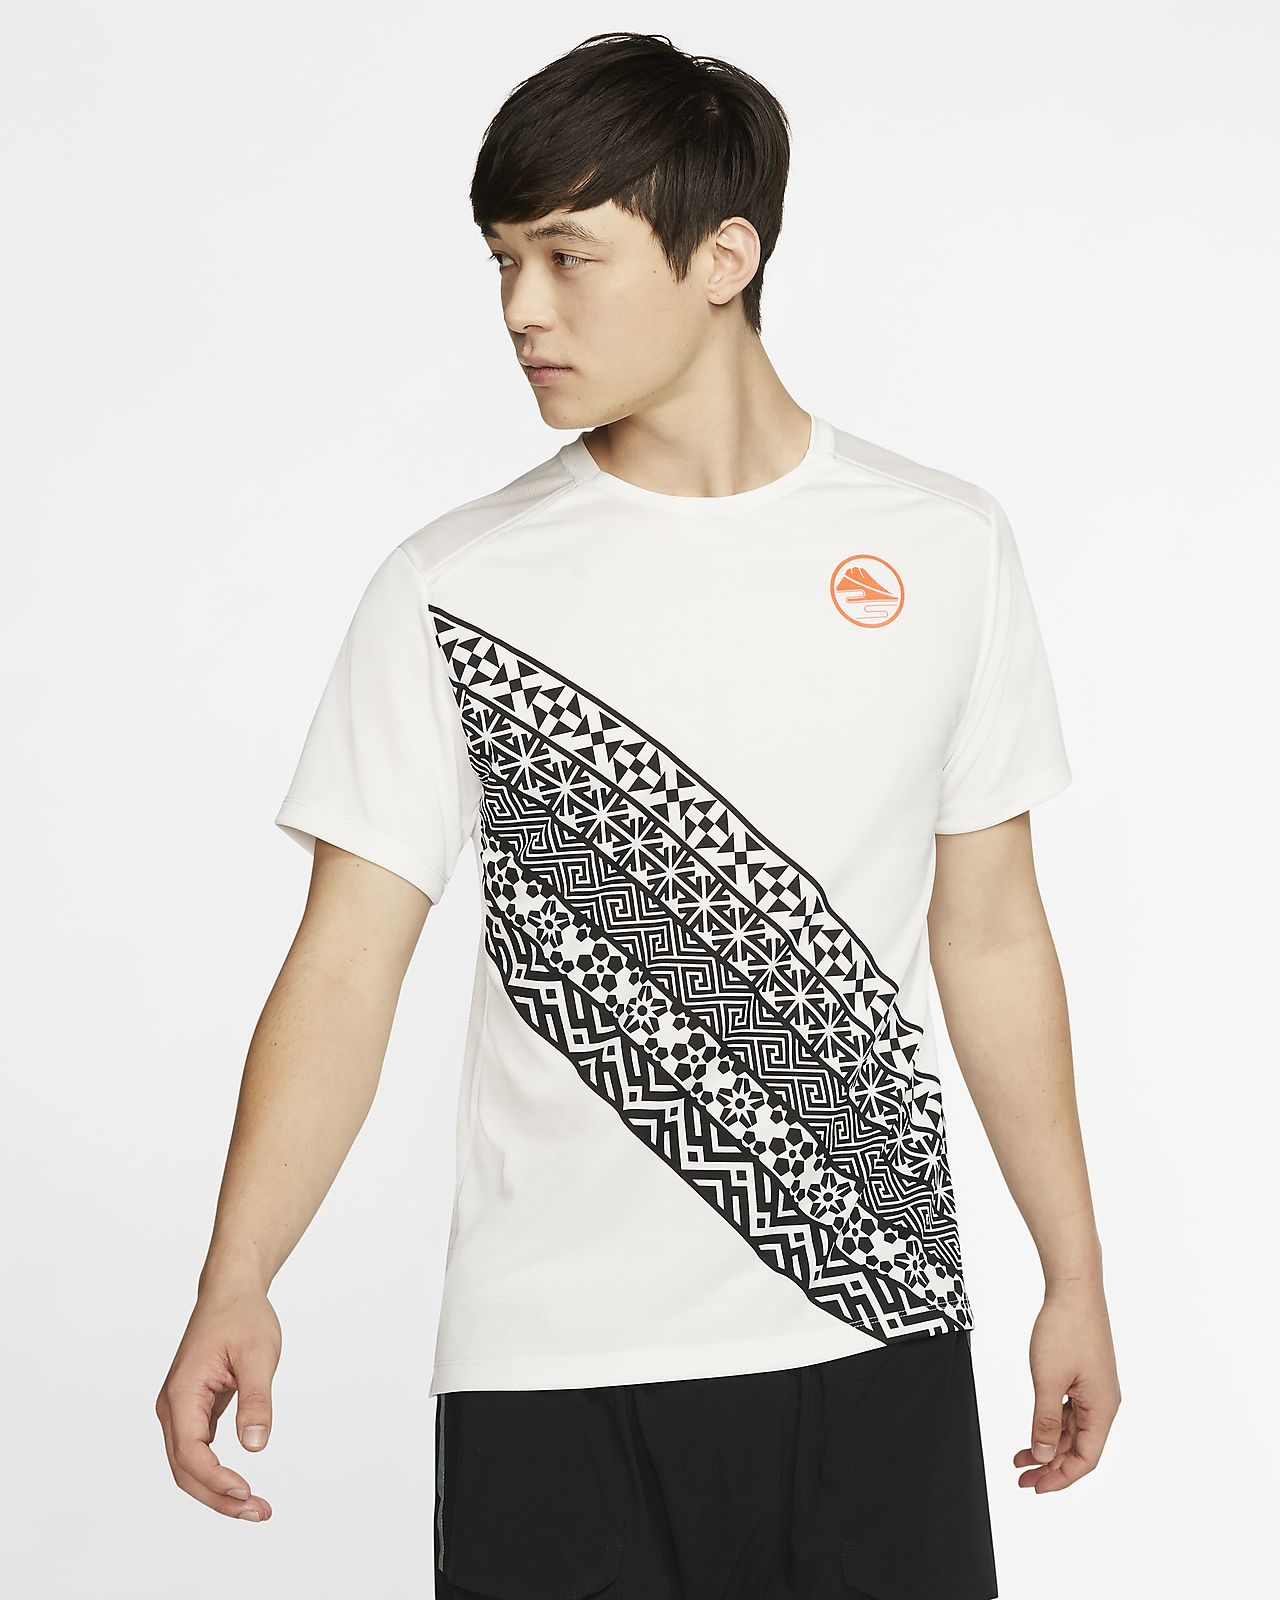 Camisola de running Nike Dri-FIT Miler para homem